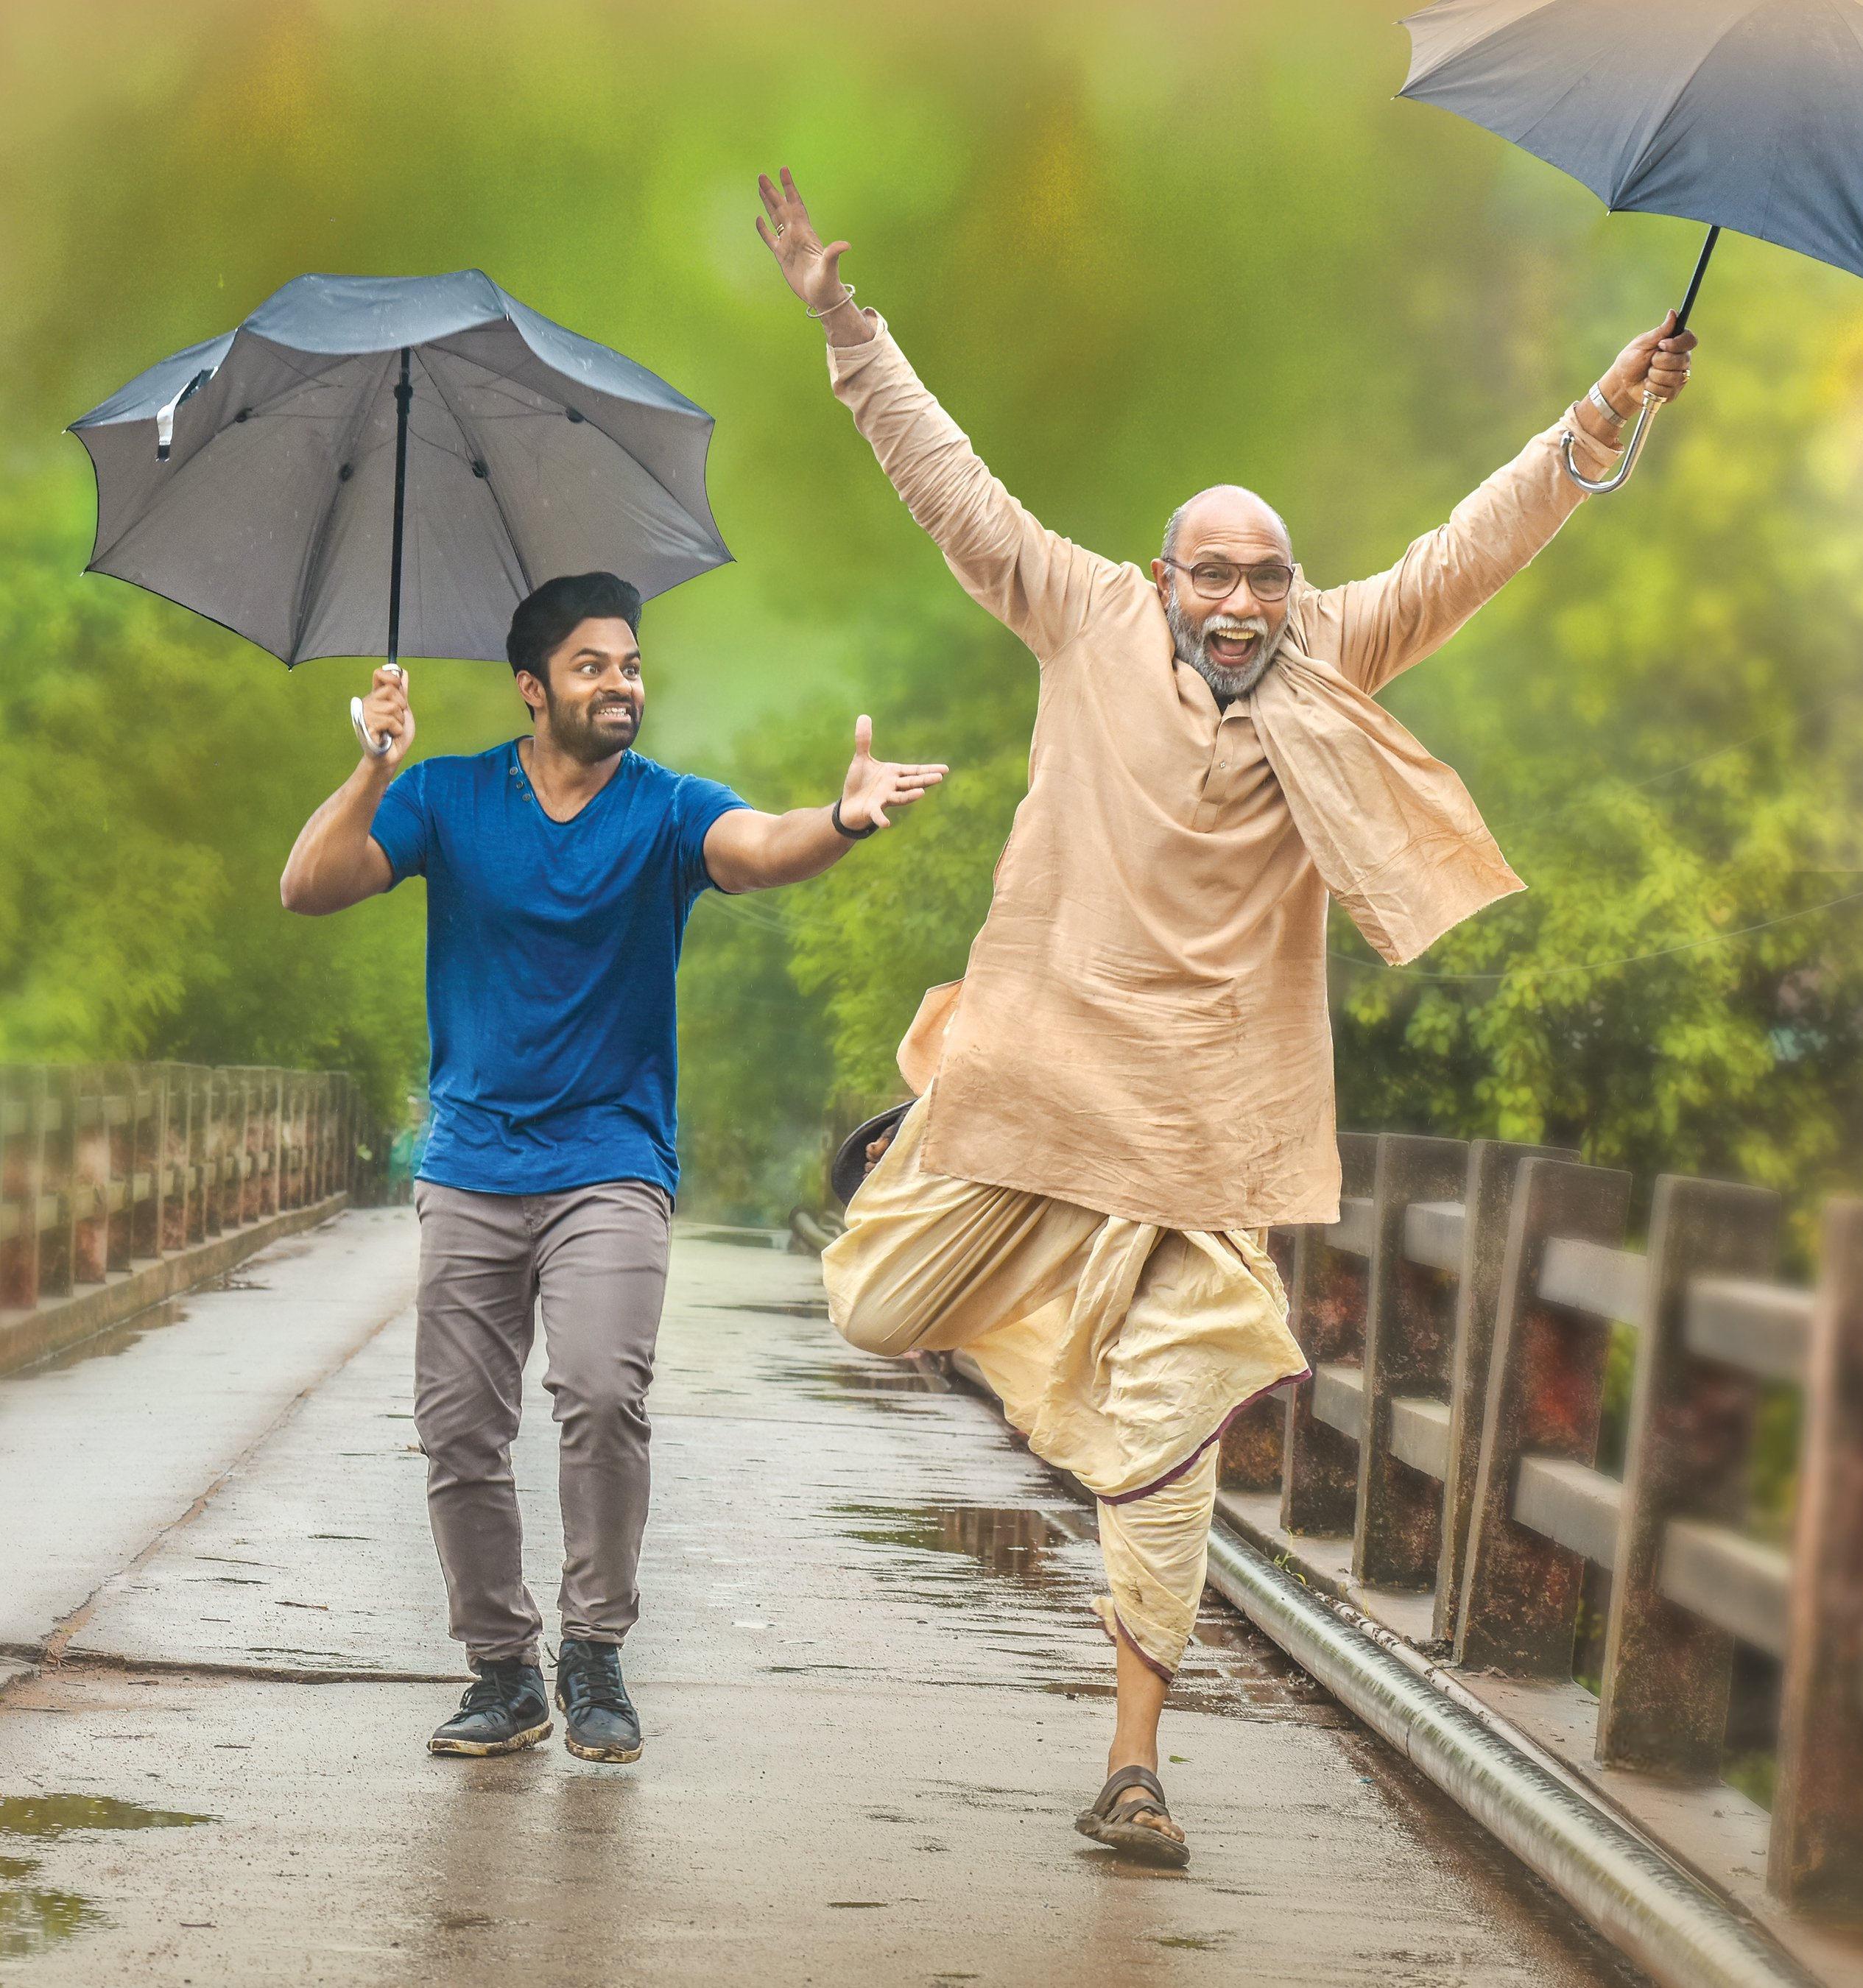 Sai Dharam Tej Sathyaraj Prathi Roju Pandage Movie First Look HD Image